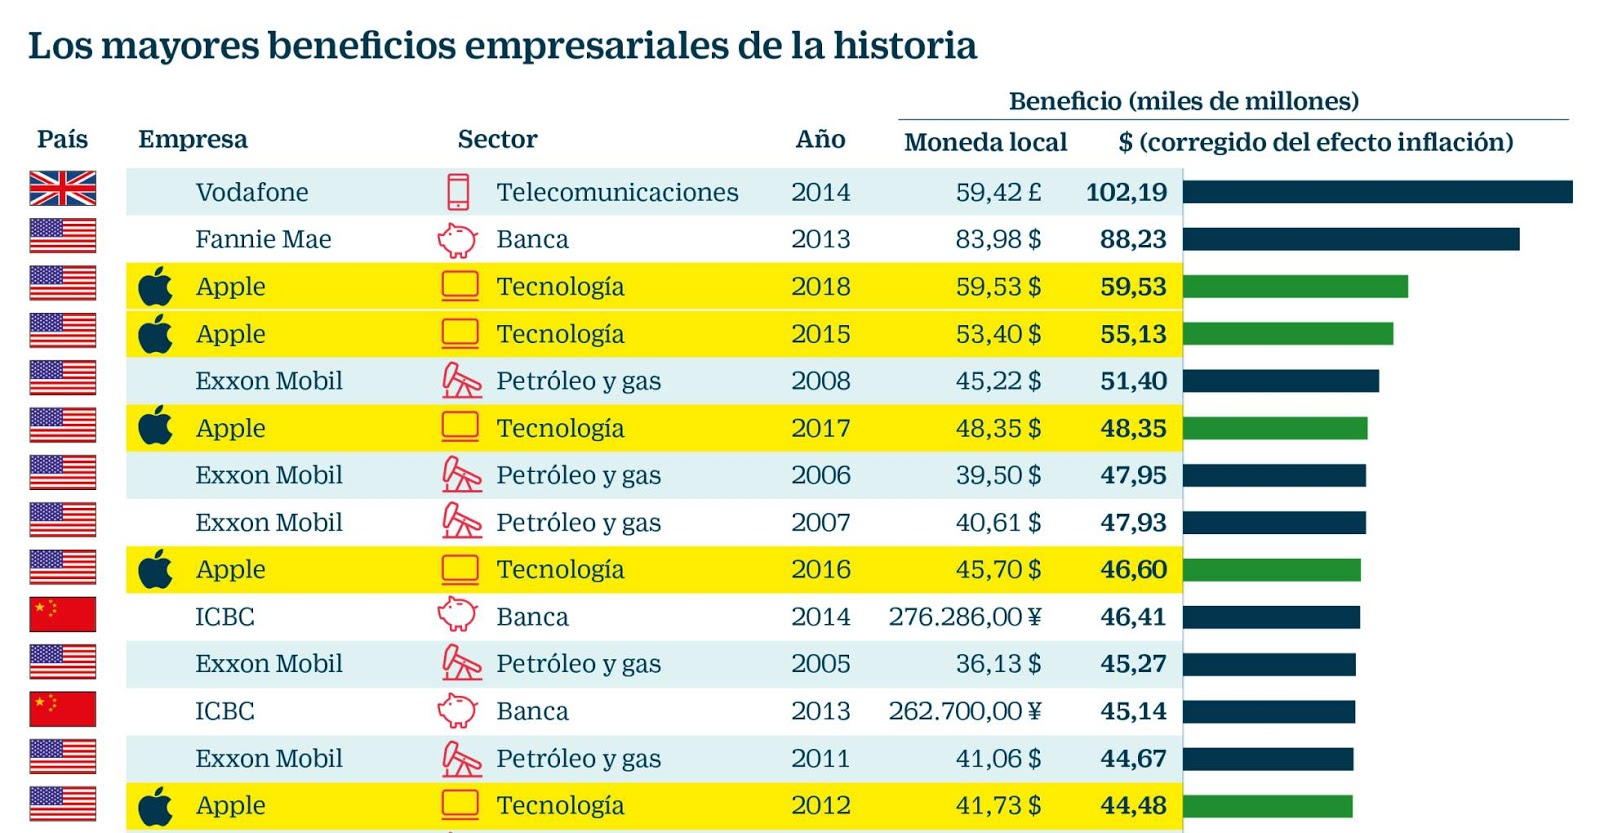 Vodafone empresa mayores beneficios historia